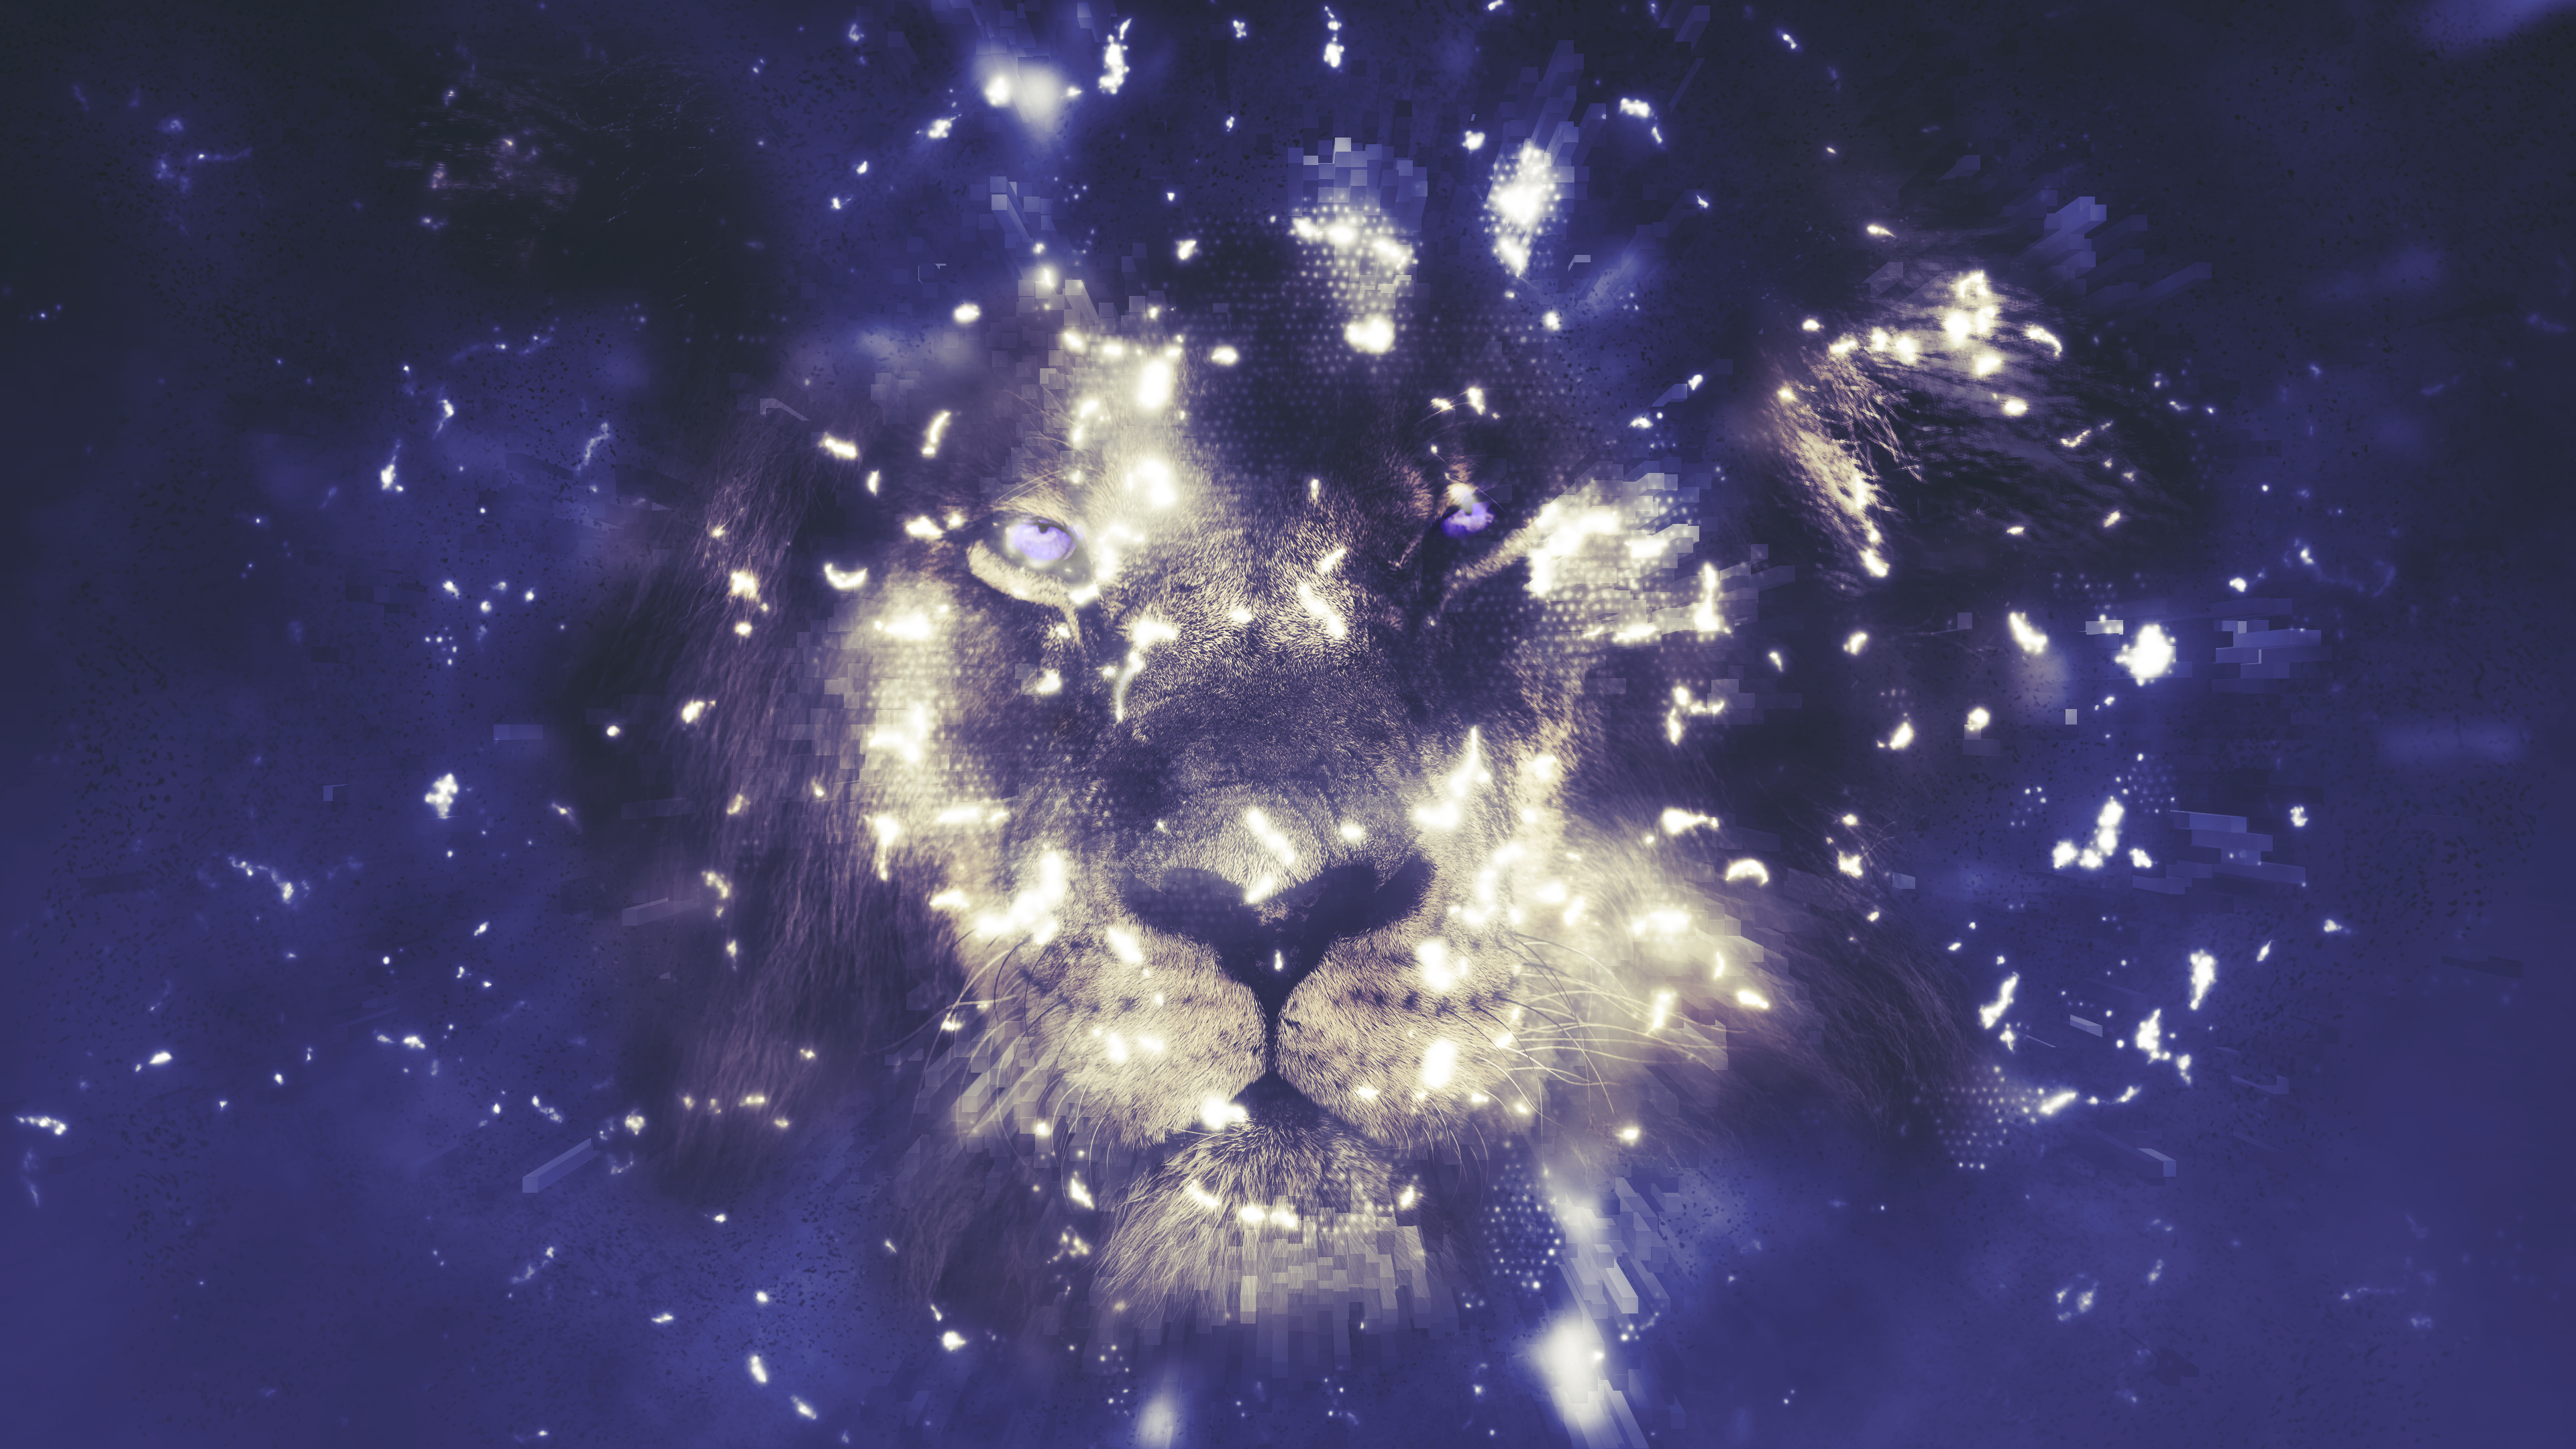 Digital Lion Chromebook Wallpaper